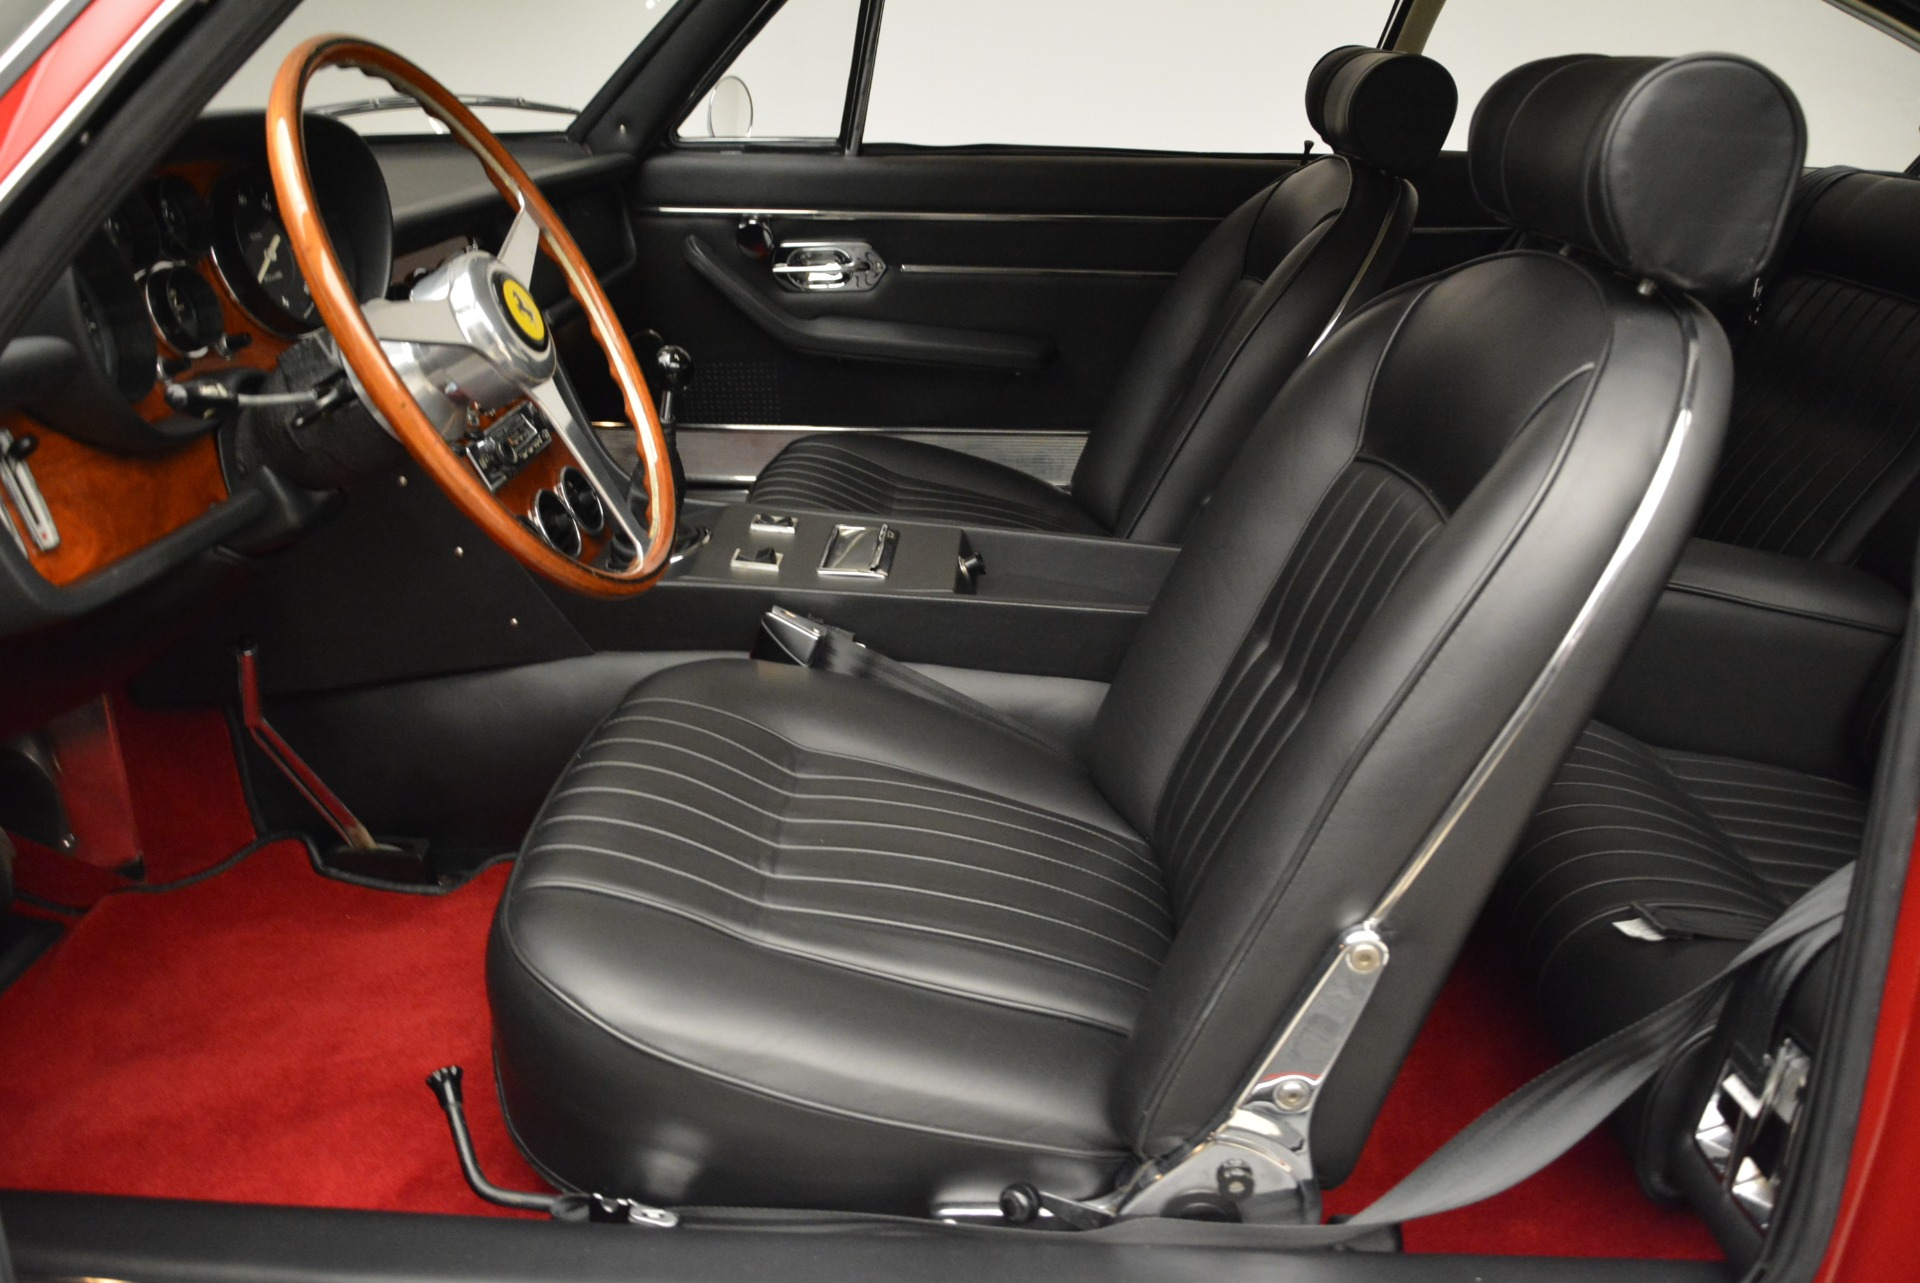 Used 1969 Ferrari 365 GT 2+2  For Sale In Greenwich, CT 1995_p14